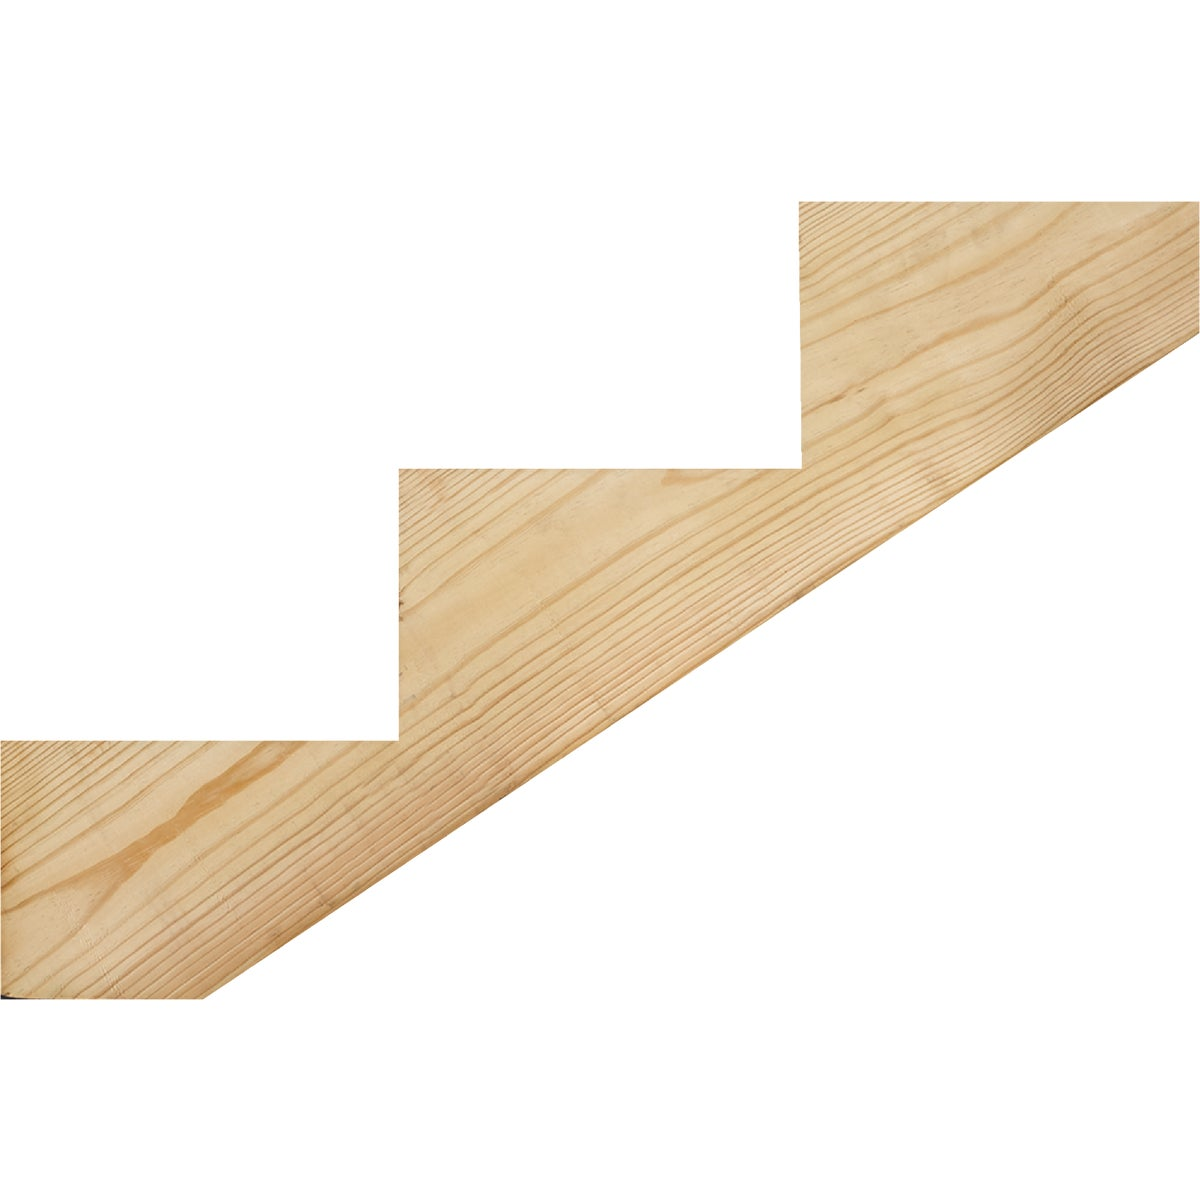 Treated Precut Stair Stringer